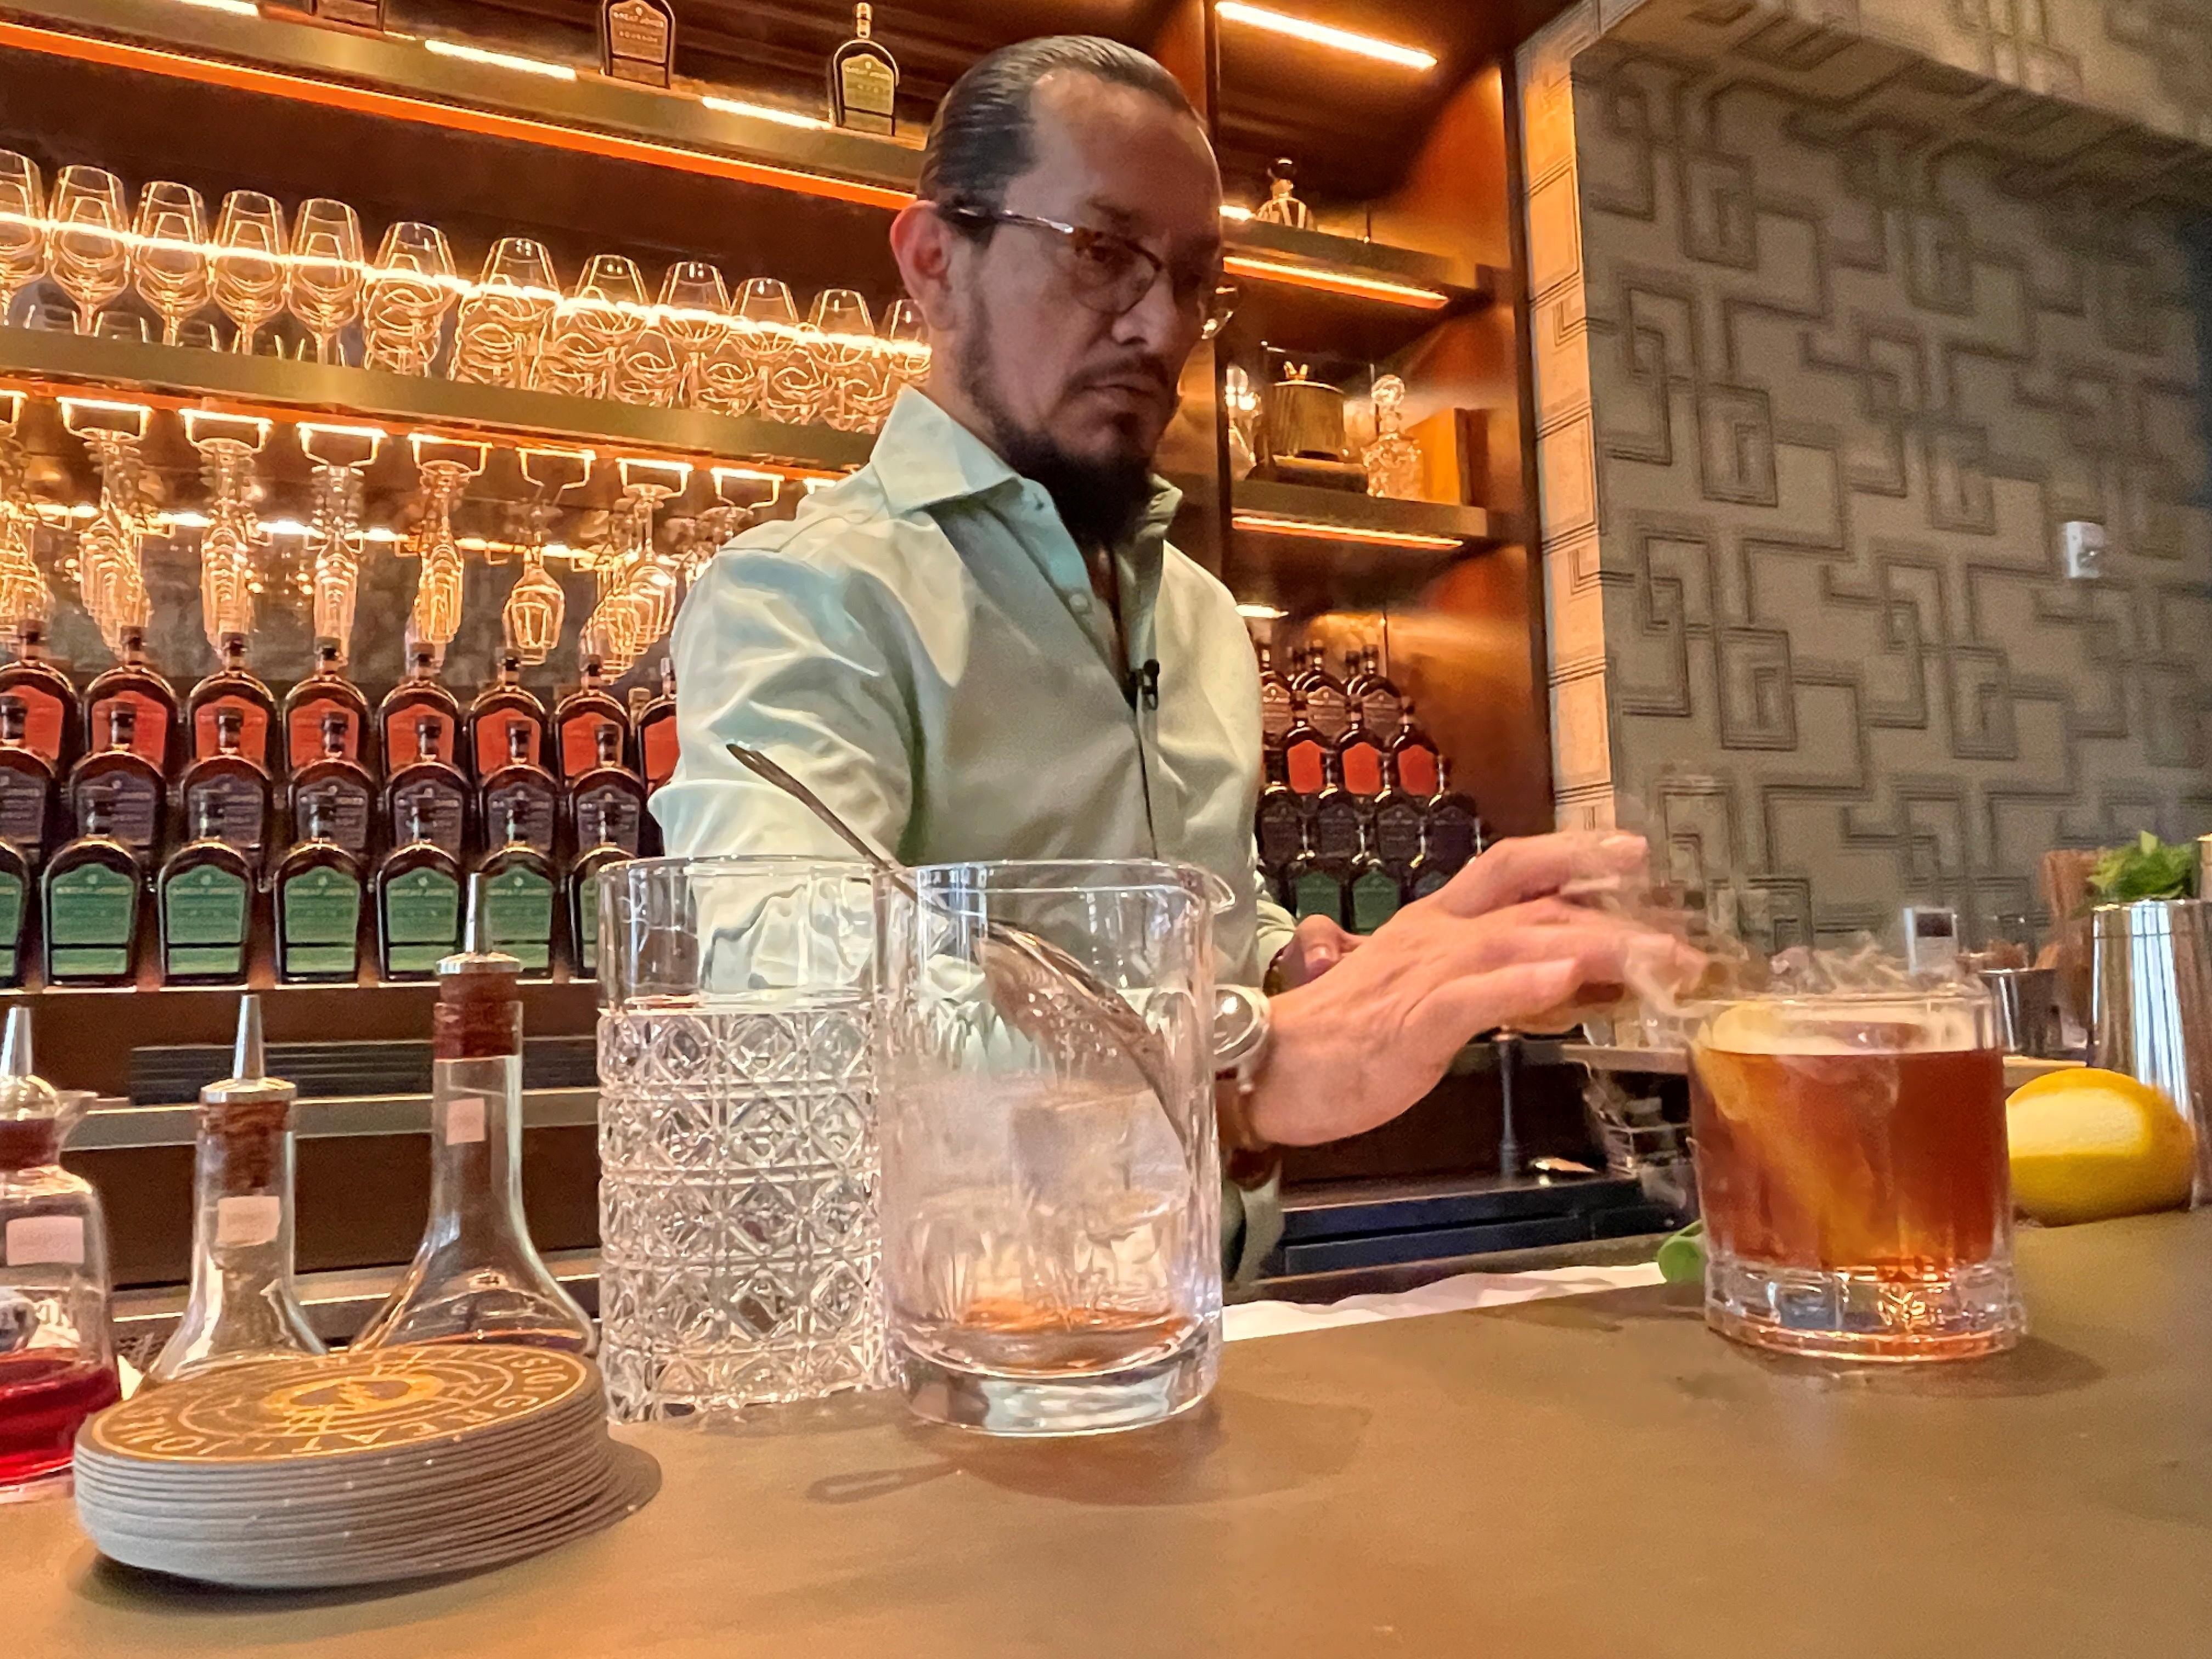 Esteban Ordonez, Great Jones Distilling Co. brand ambassador, makes a smoked Old Fashioned drink in New York, NY, U.S., September 16, 2021. Picture taken September 16, 2021. REUTERS/Roselle Chen